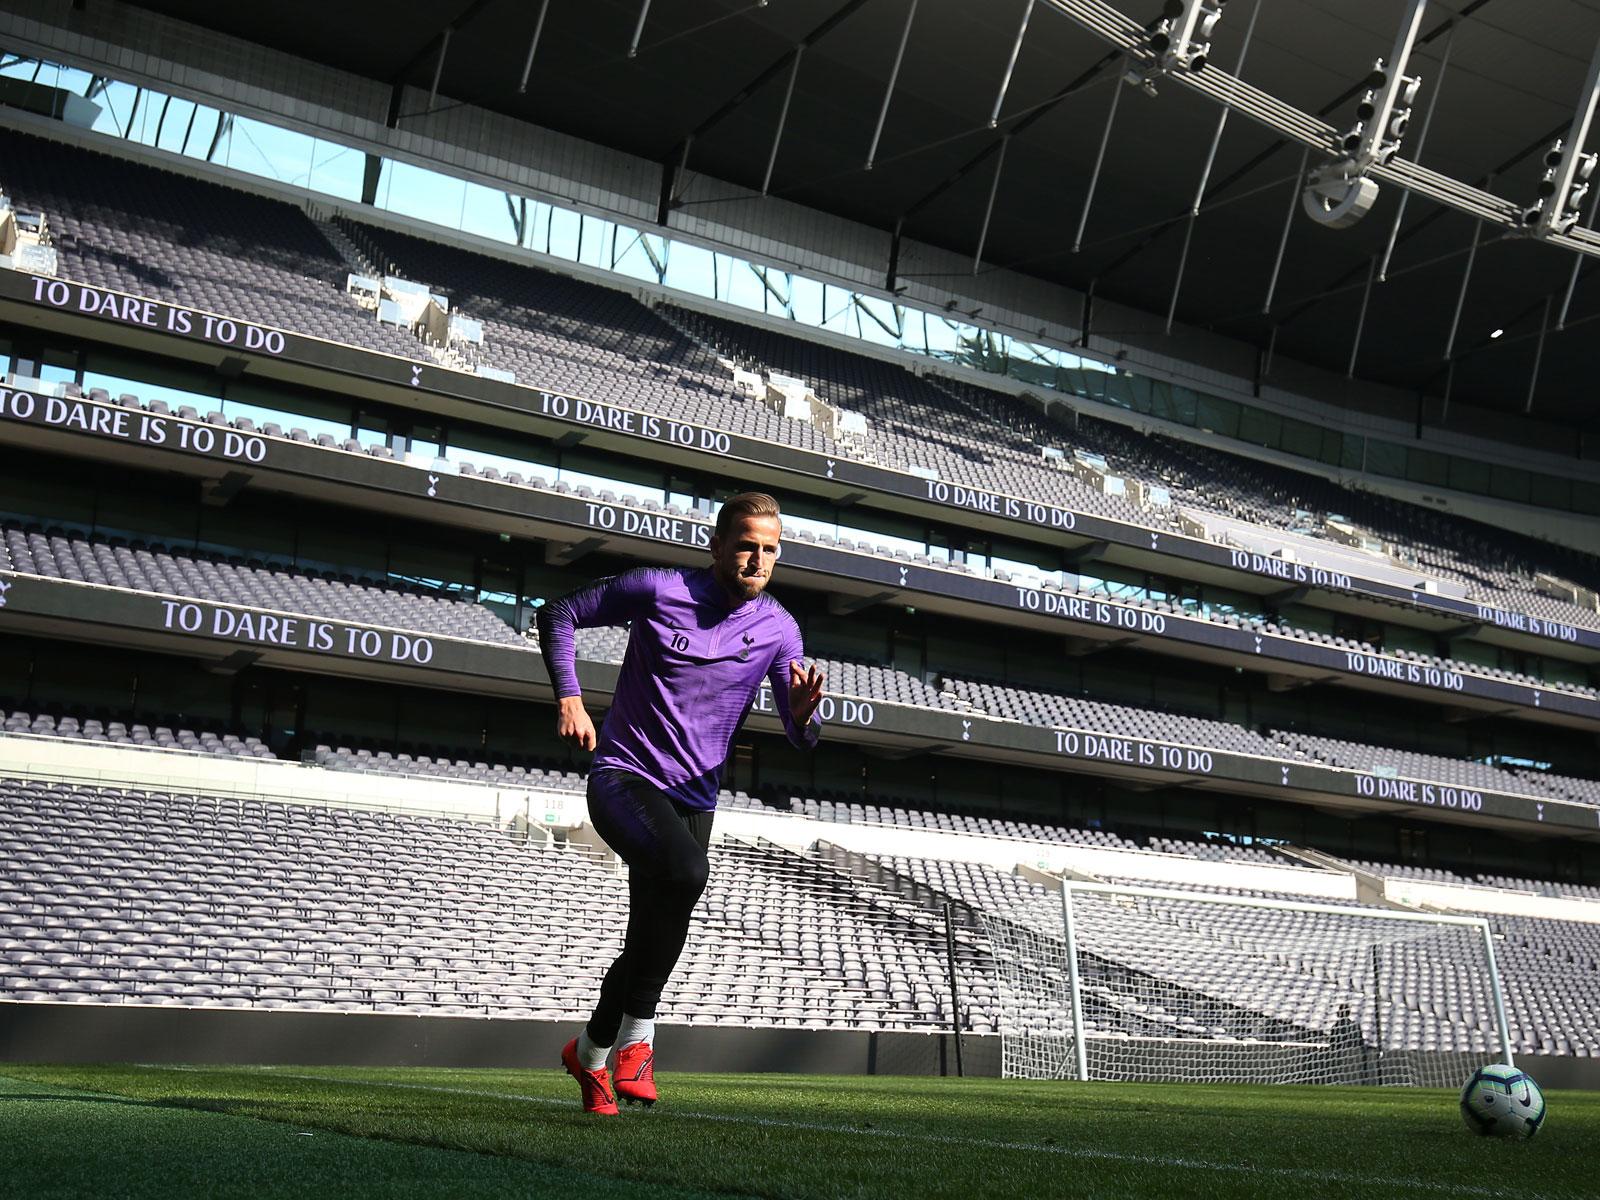 Harry Kane trains in Tottenham's new stadium